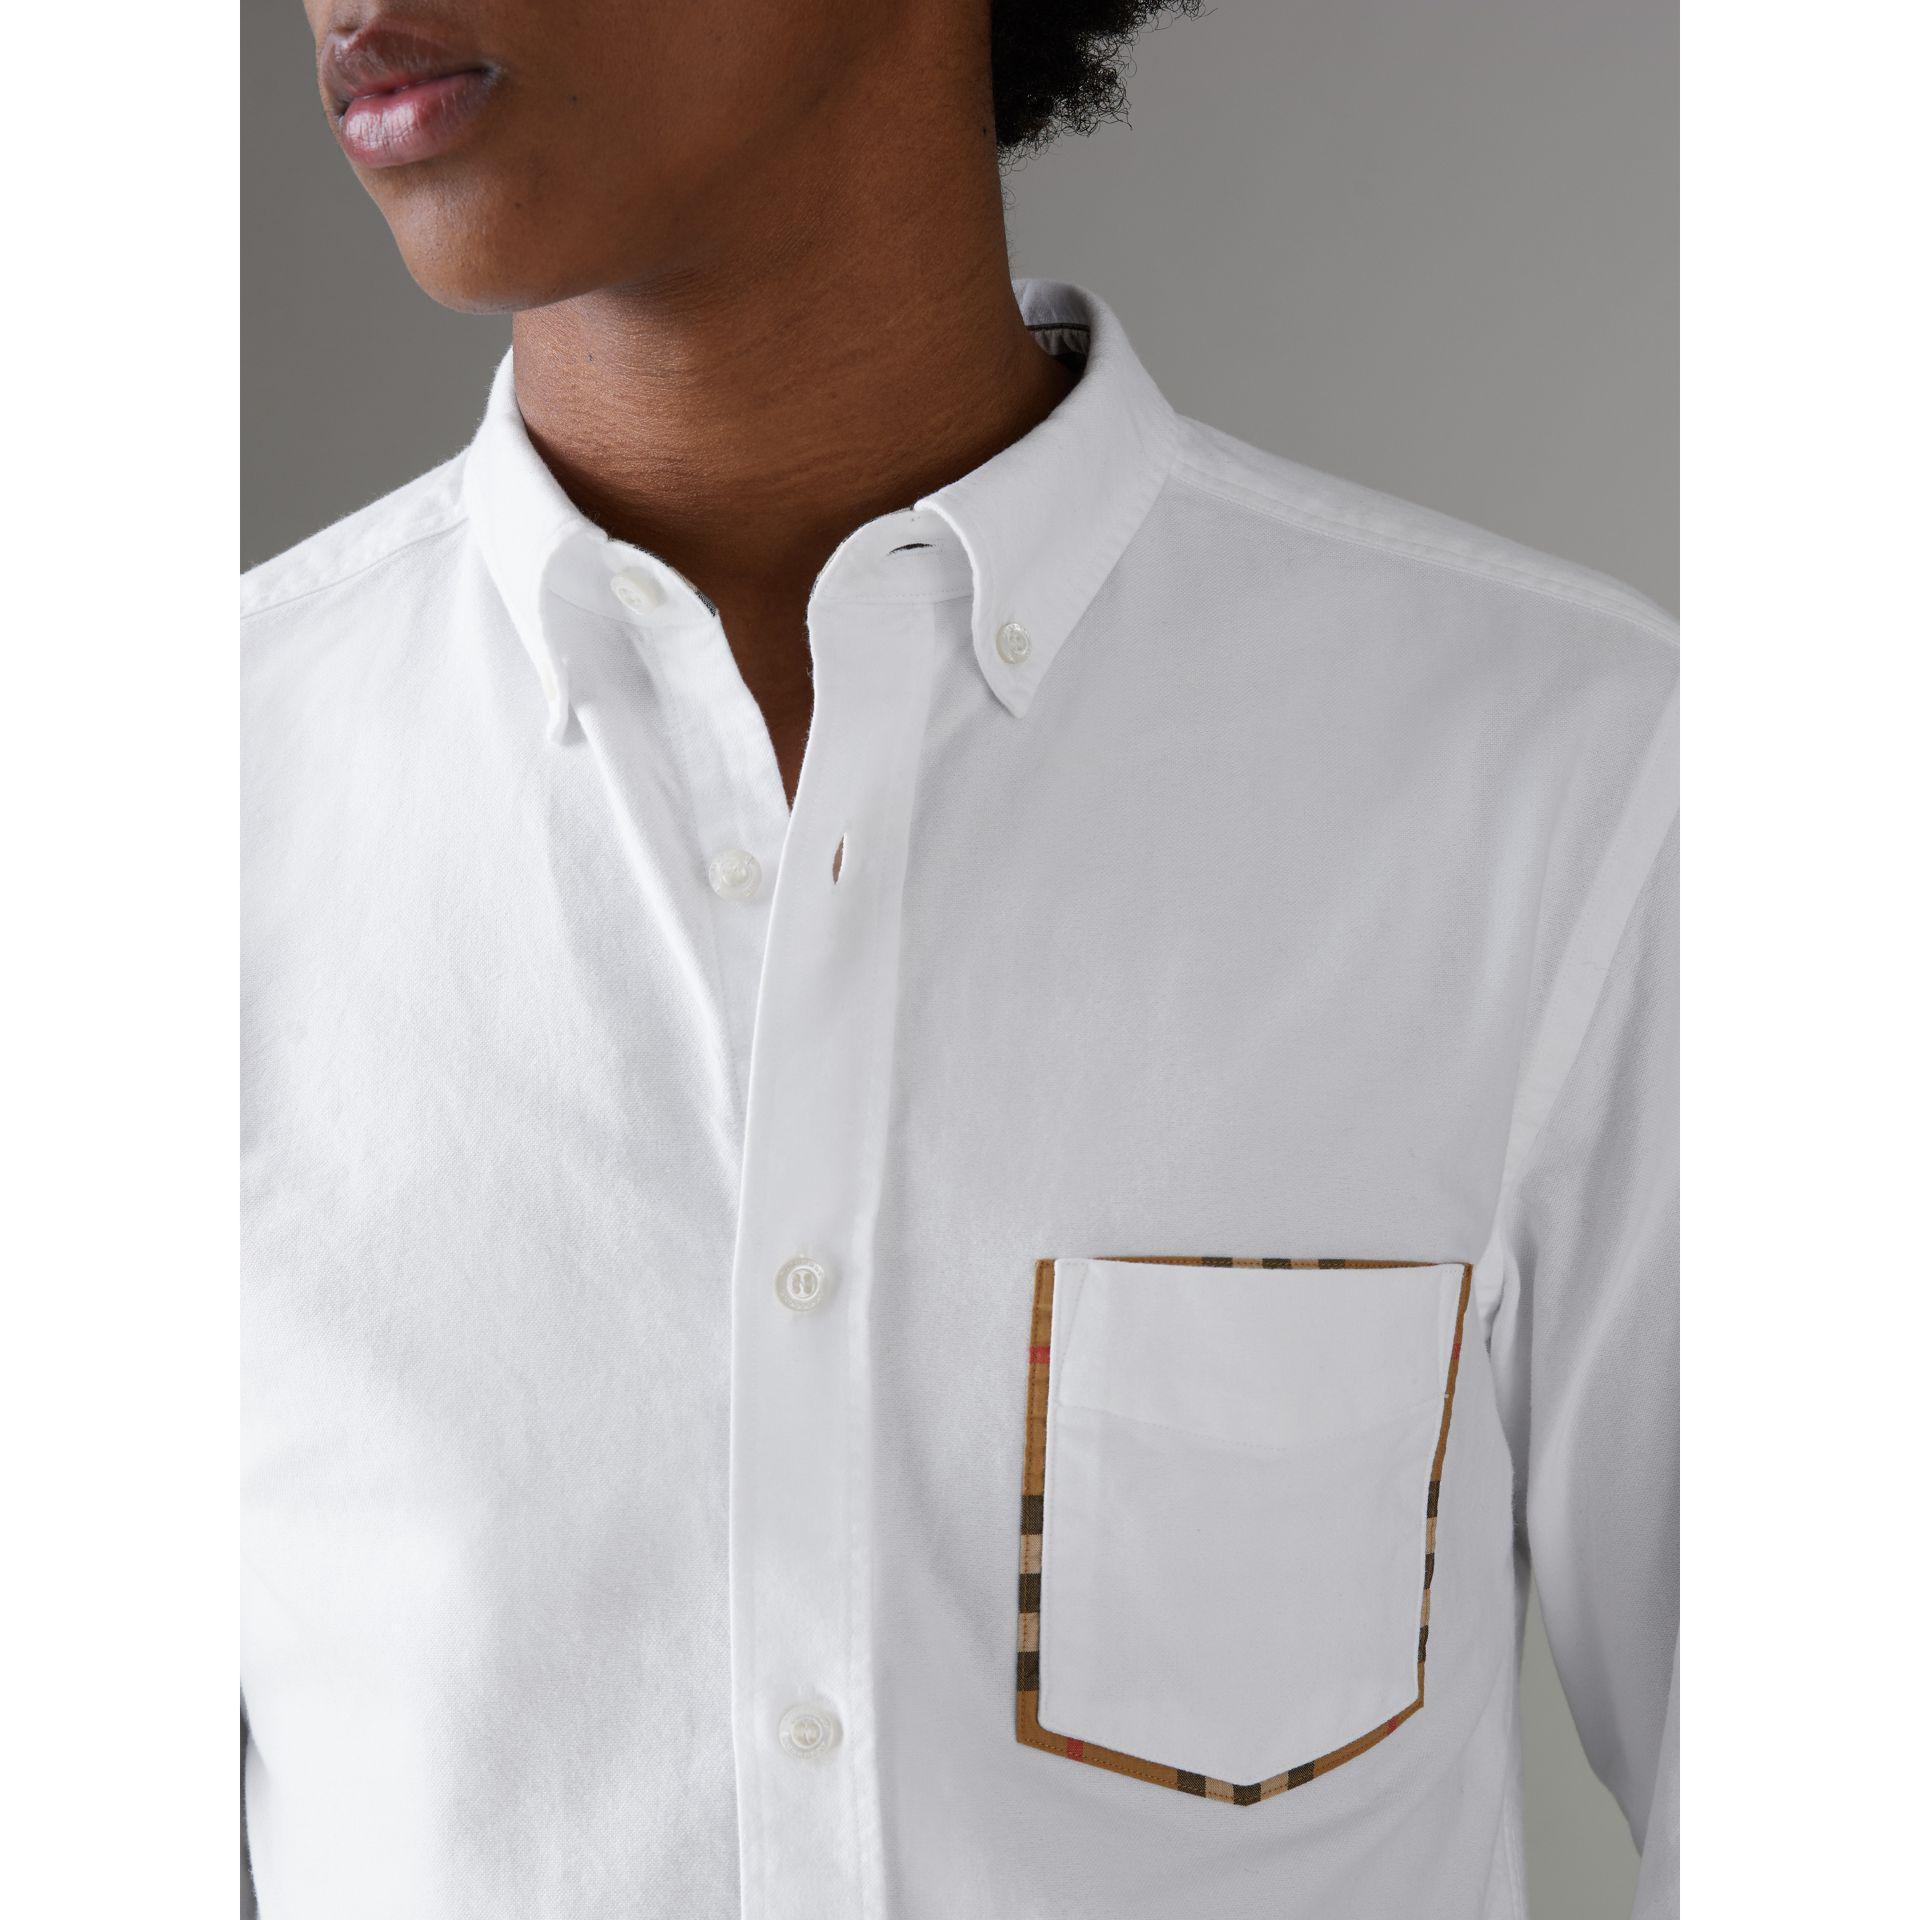 a56d53172 Burberry Check Detail Cotton Oxford Shirt for Men - Lyst